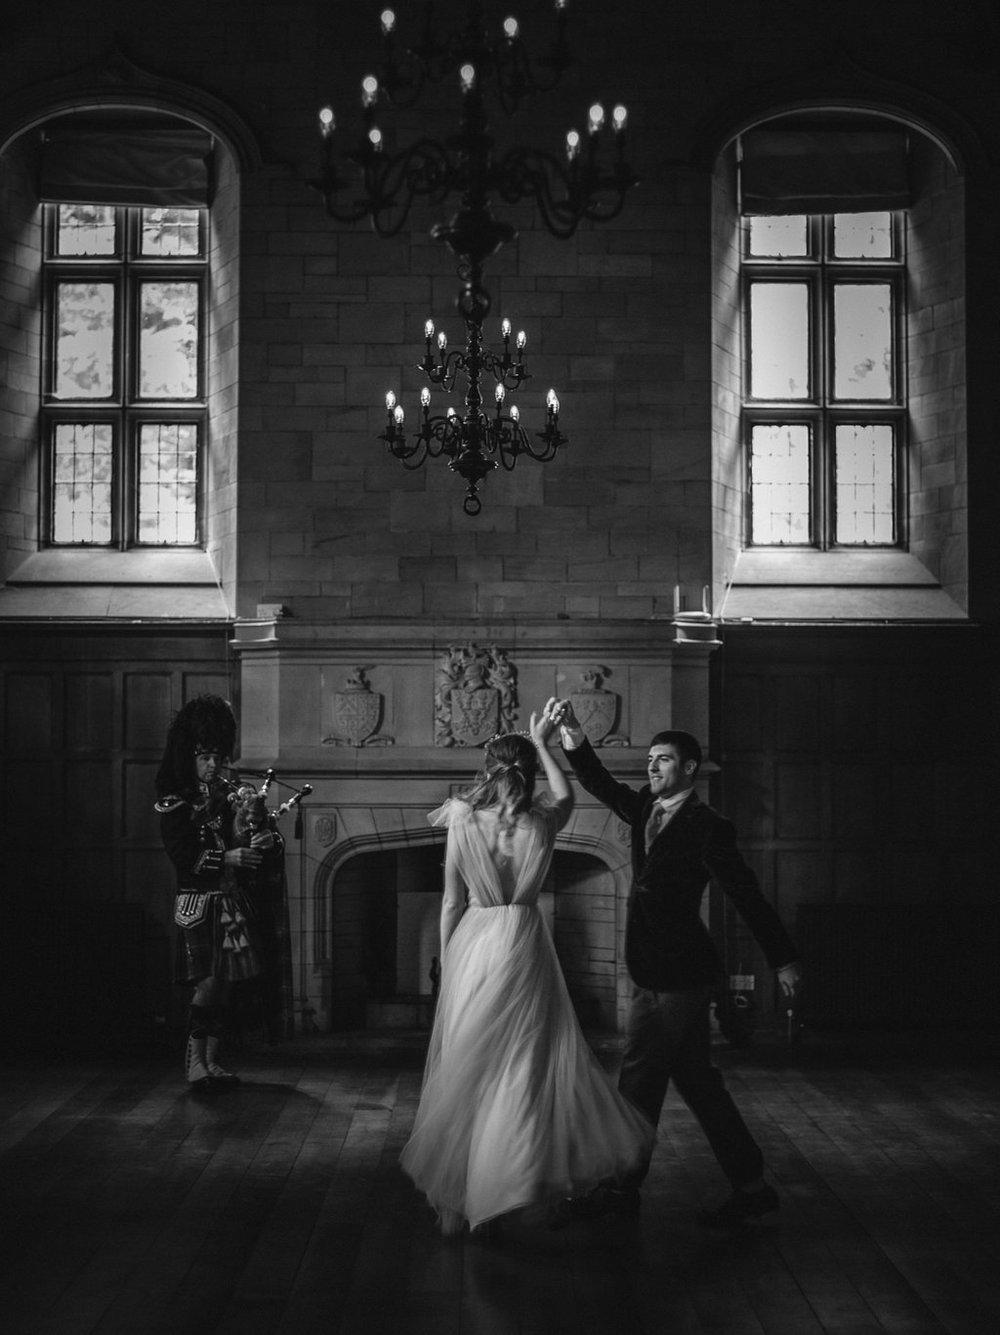 Well+Travelled+Bride+Scottish+Highlands+Wedding+Bride+and+Groom.jpeg